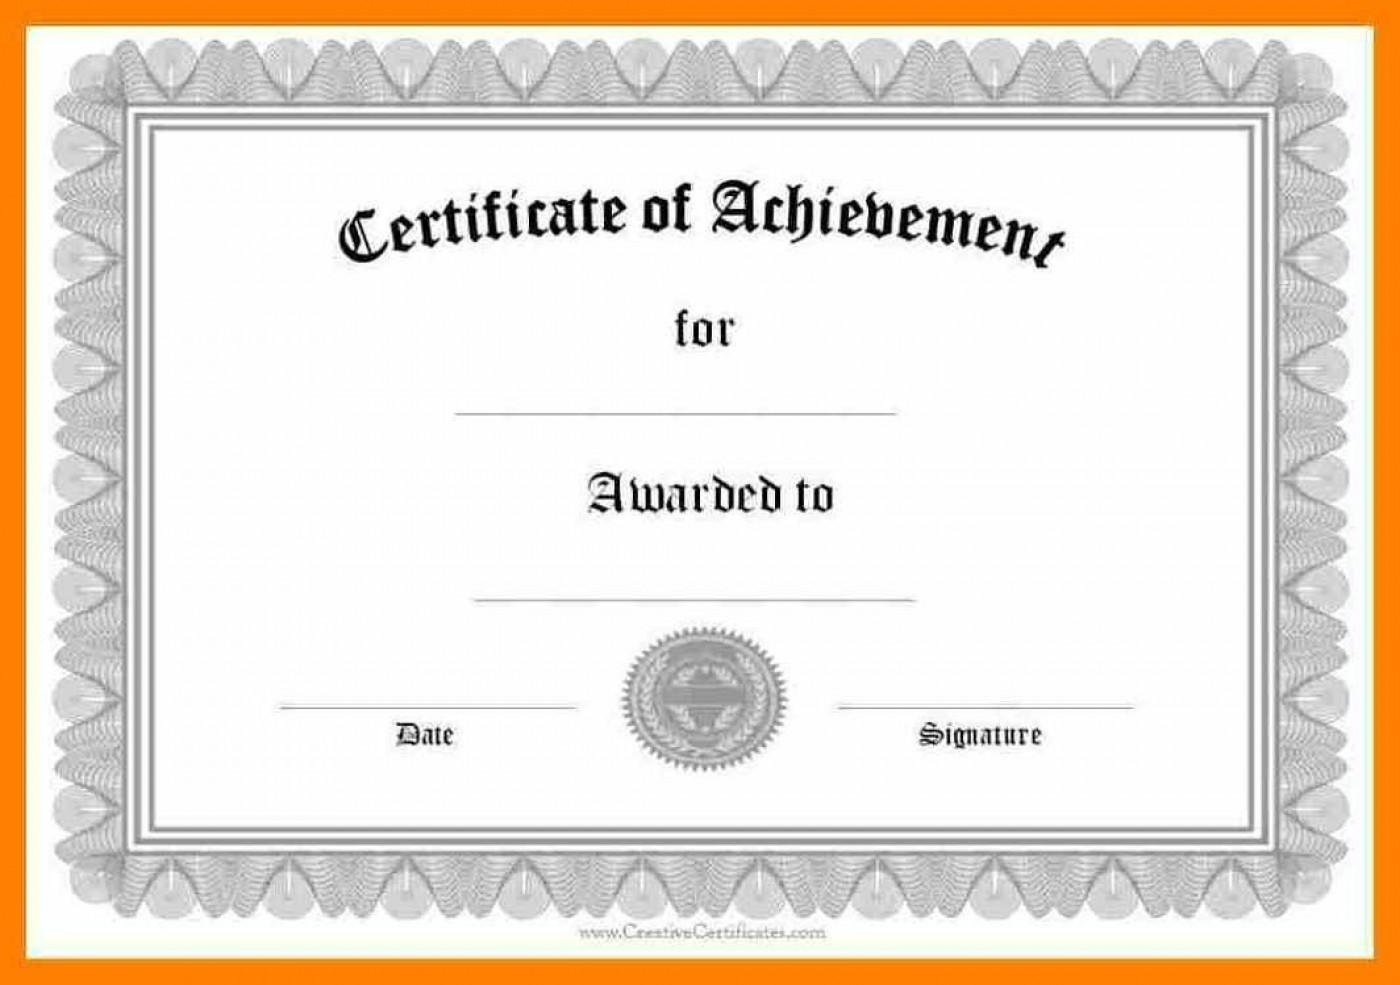 006 Wondrou Certificate Of Award Template Word Free High Def 1400